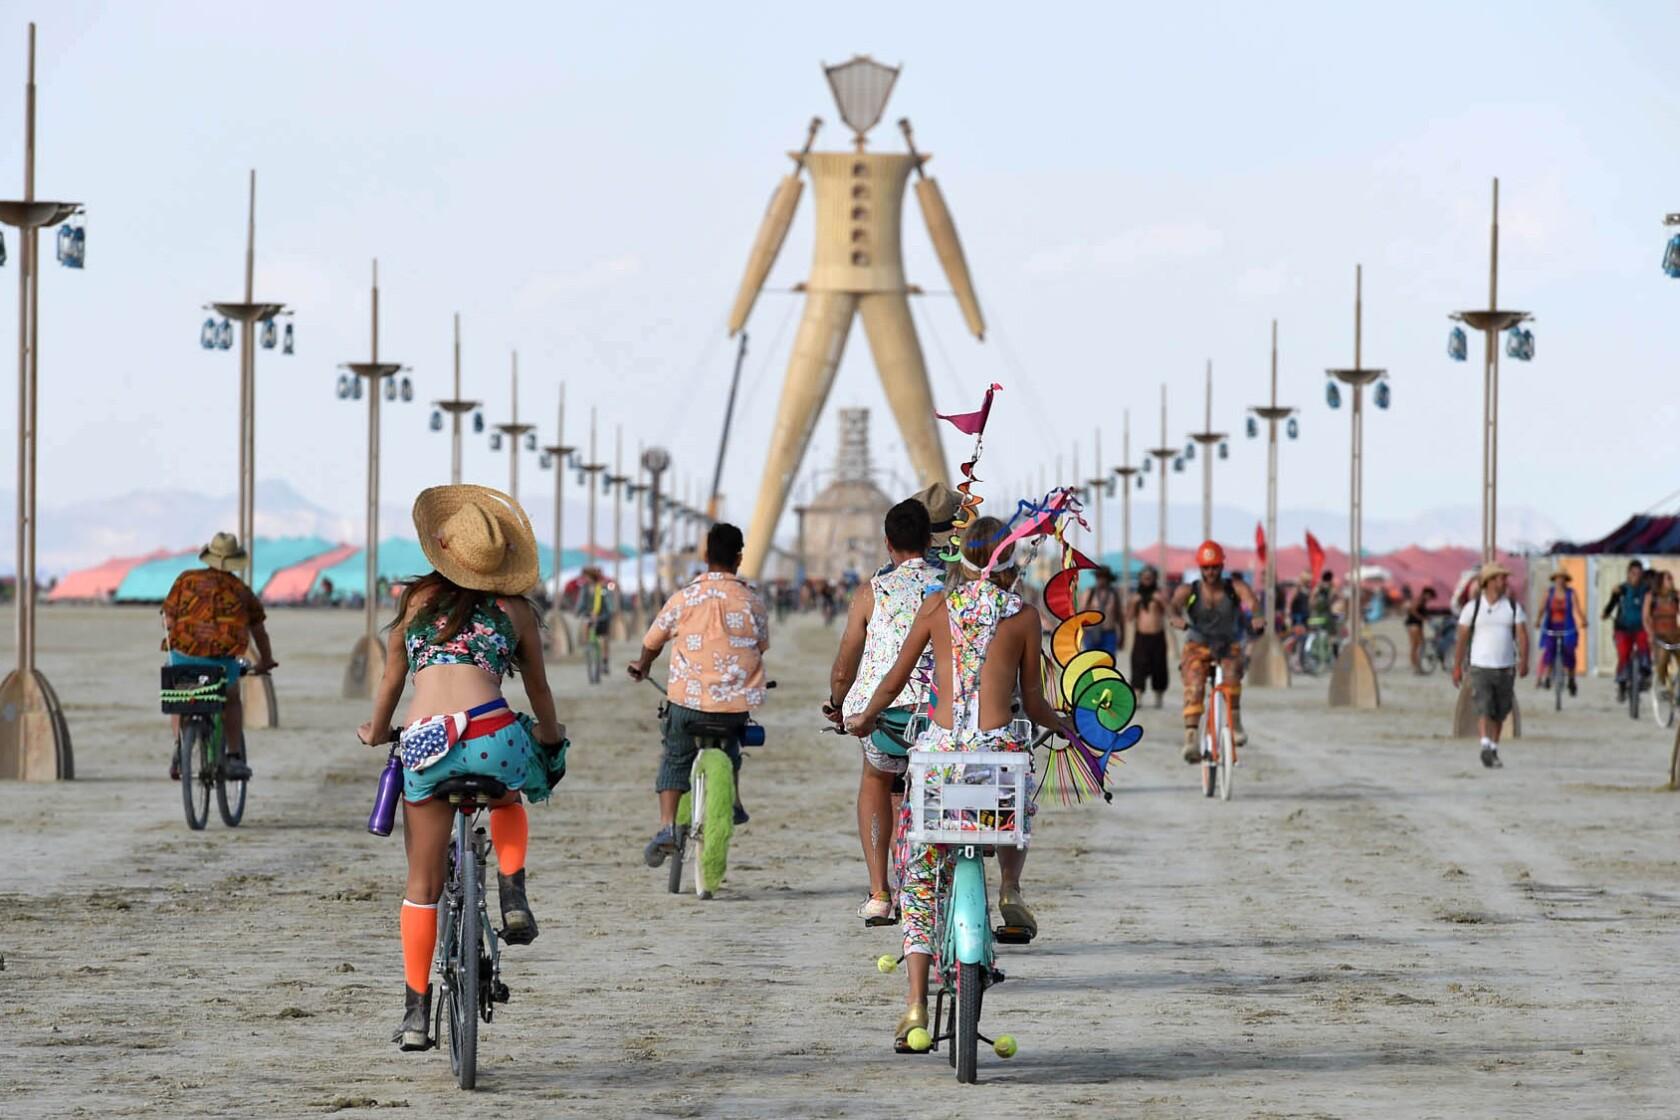 A Reno first: Burning Man man being built here